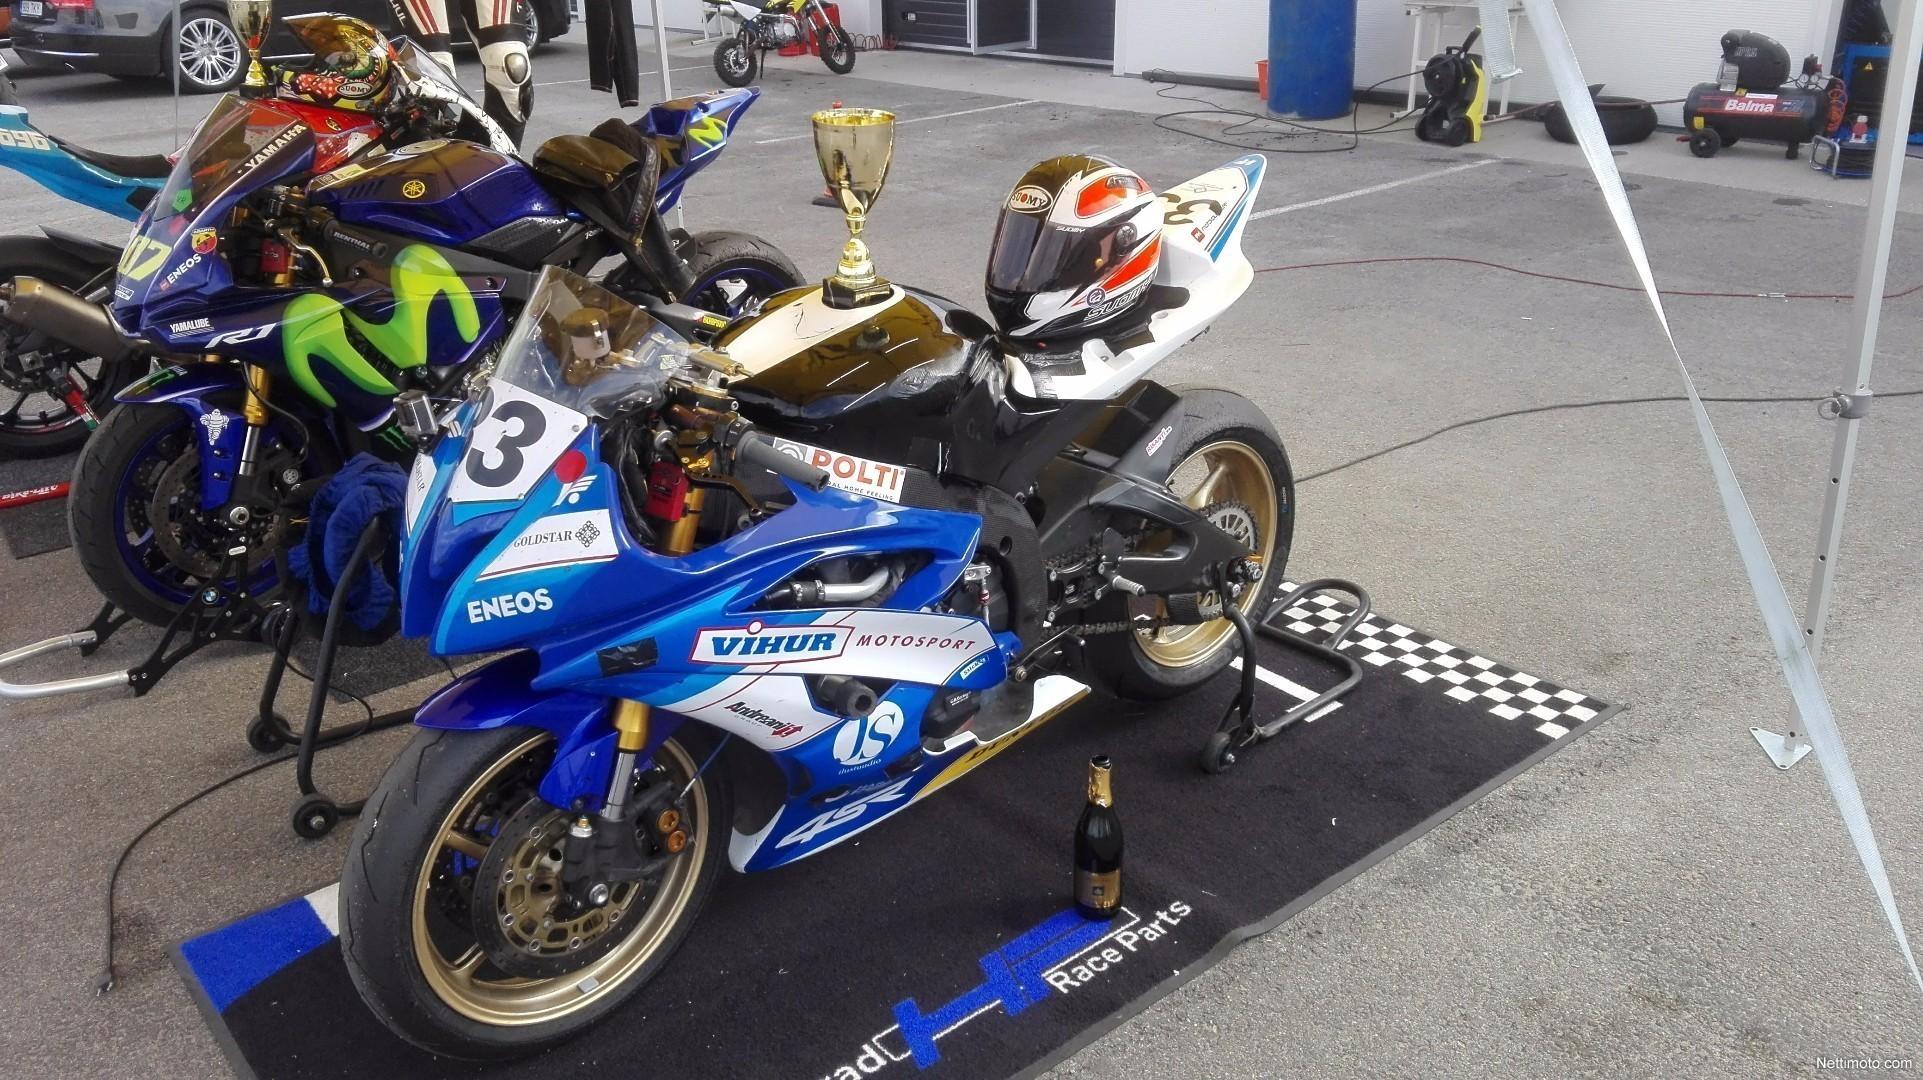 Yamaha Yzf R6 600 Cm 2013 Motorcycle Nettimoto Engine Parts Diagram